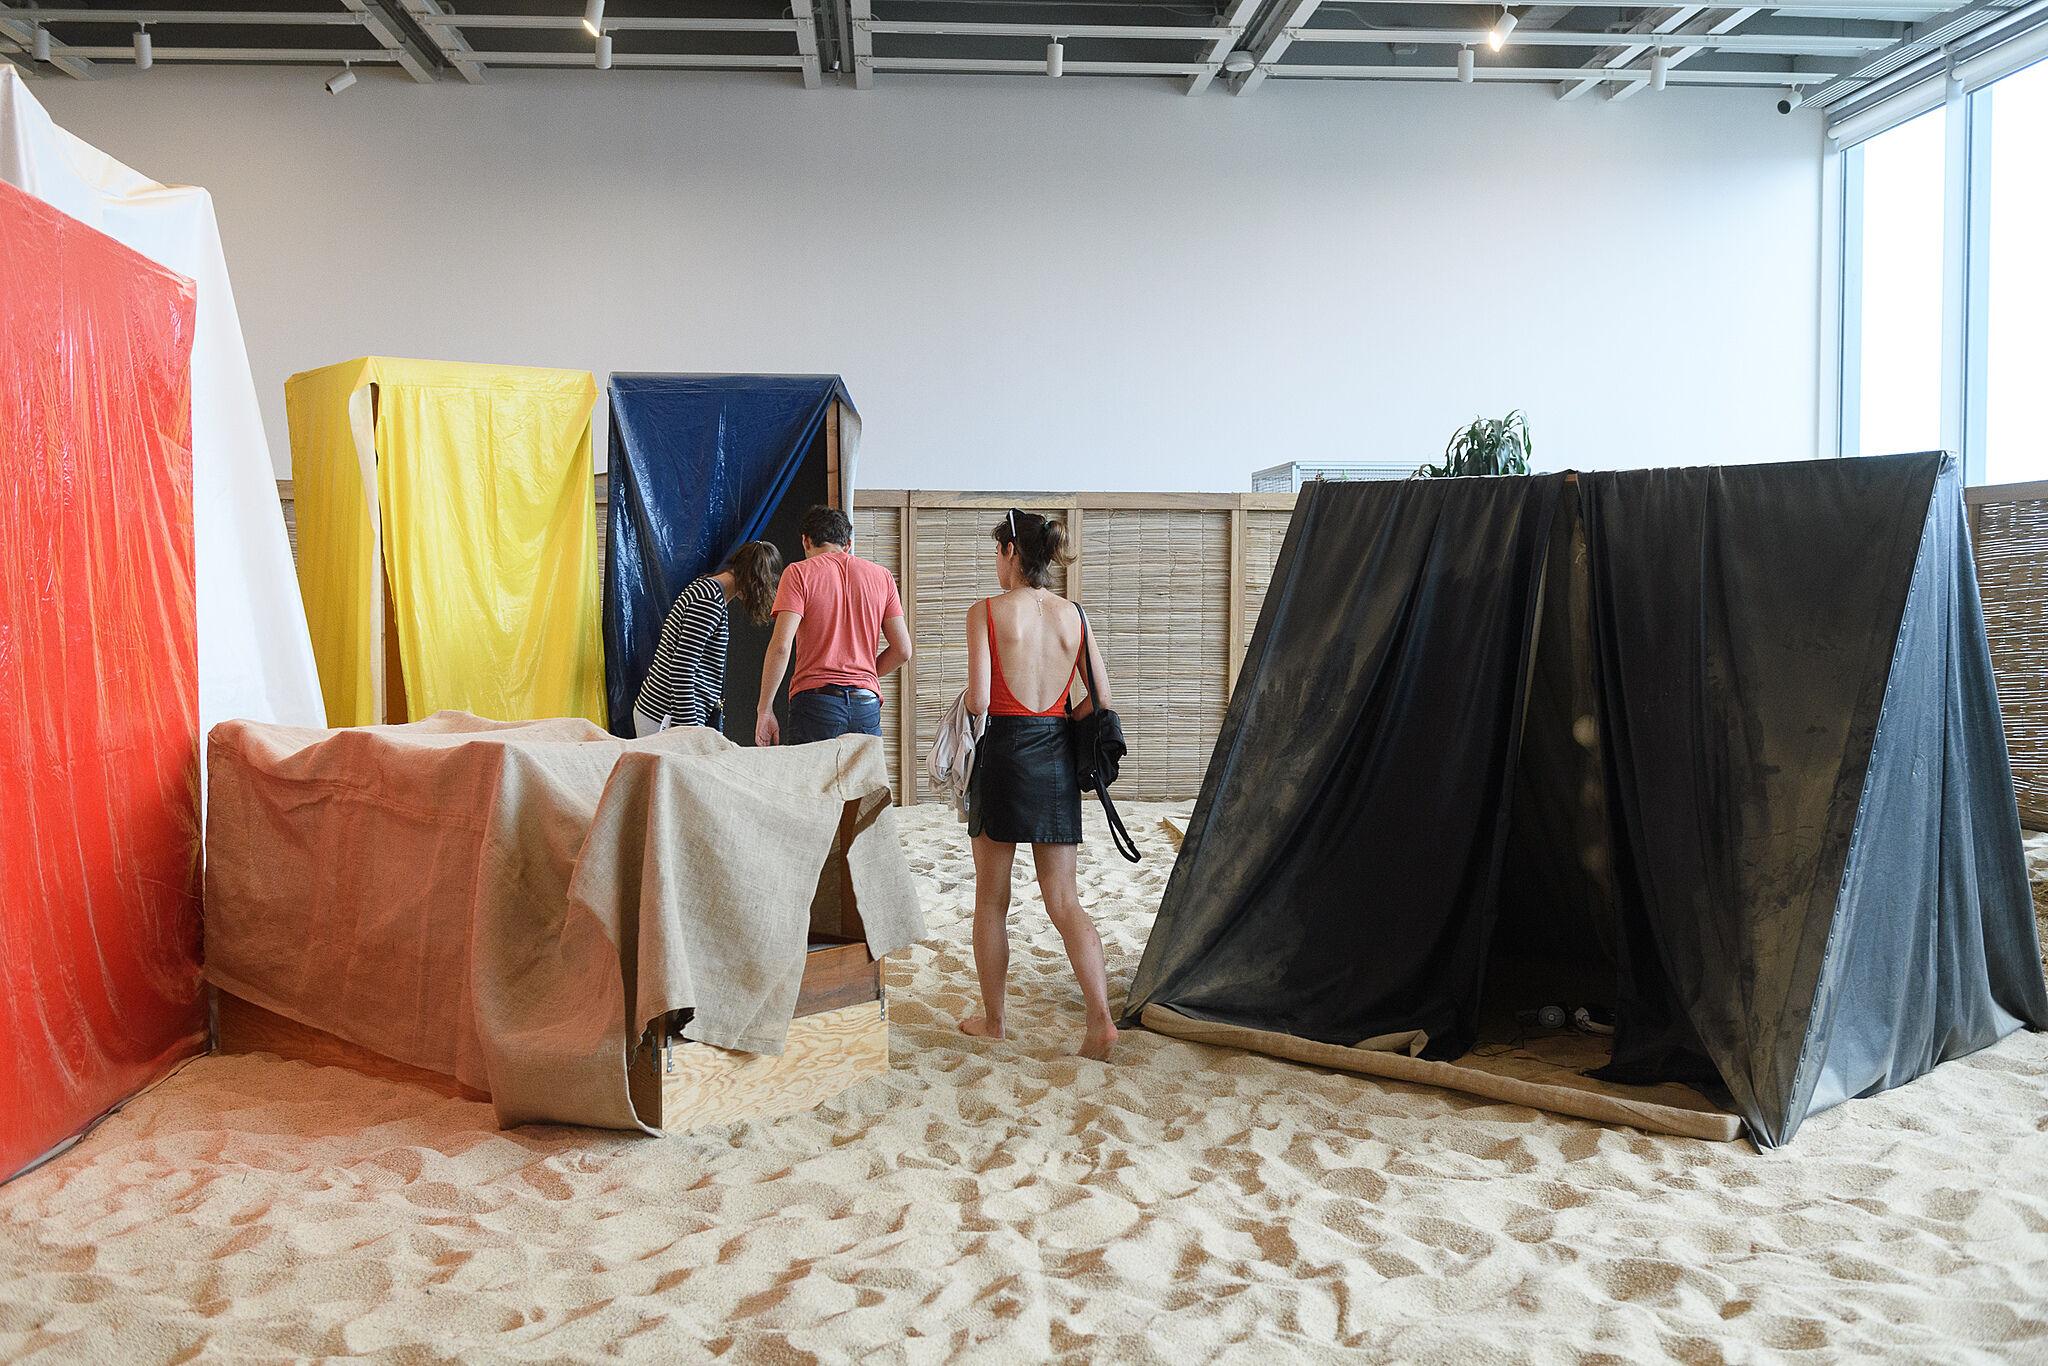 Visitors walking through the Helio Oiticica exhibition